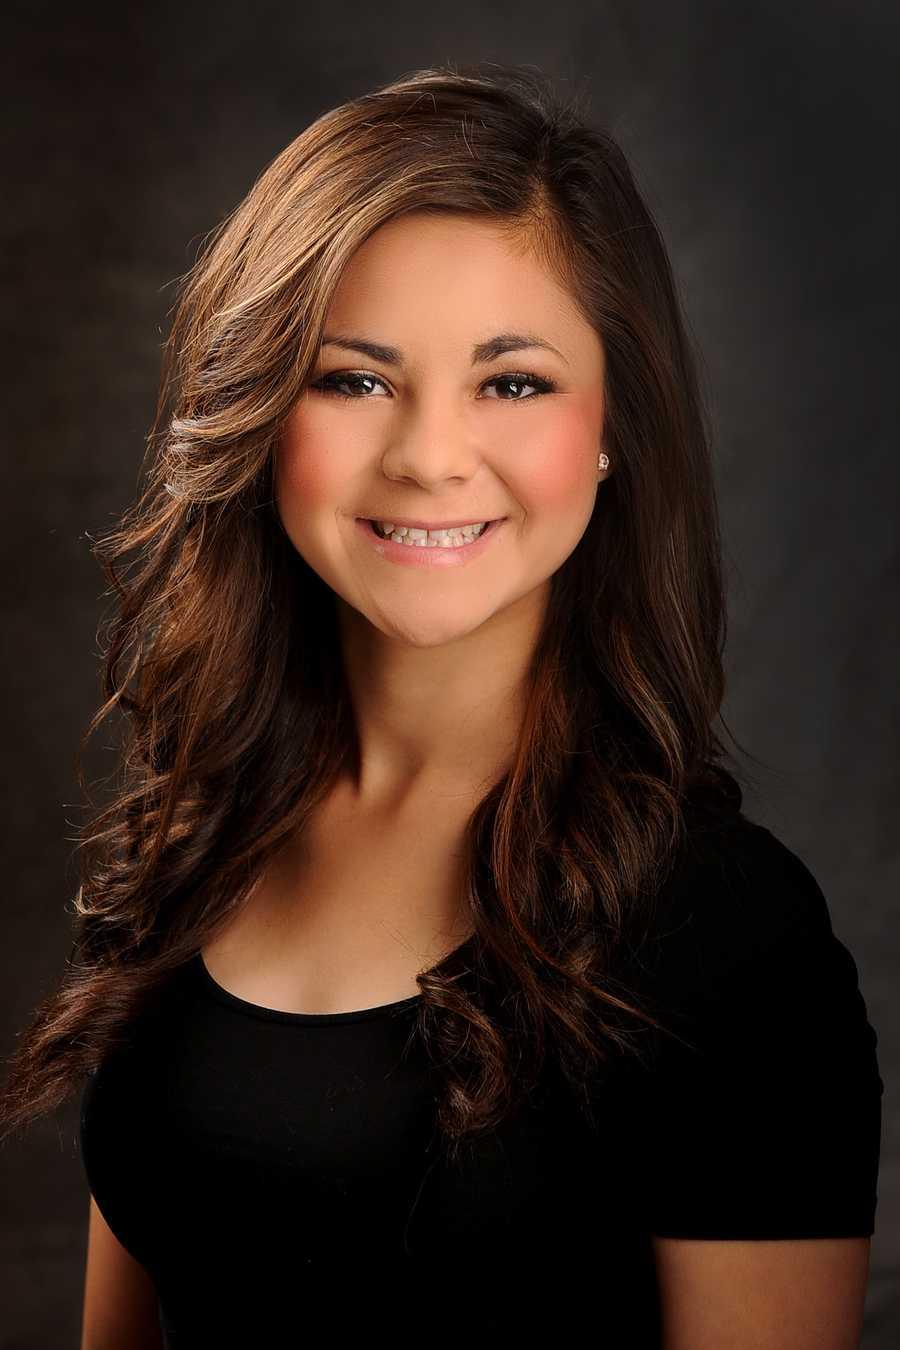 Olivia Austin, Miss Roosevelt County